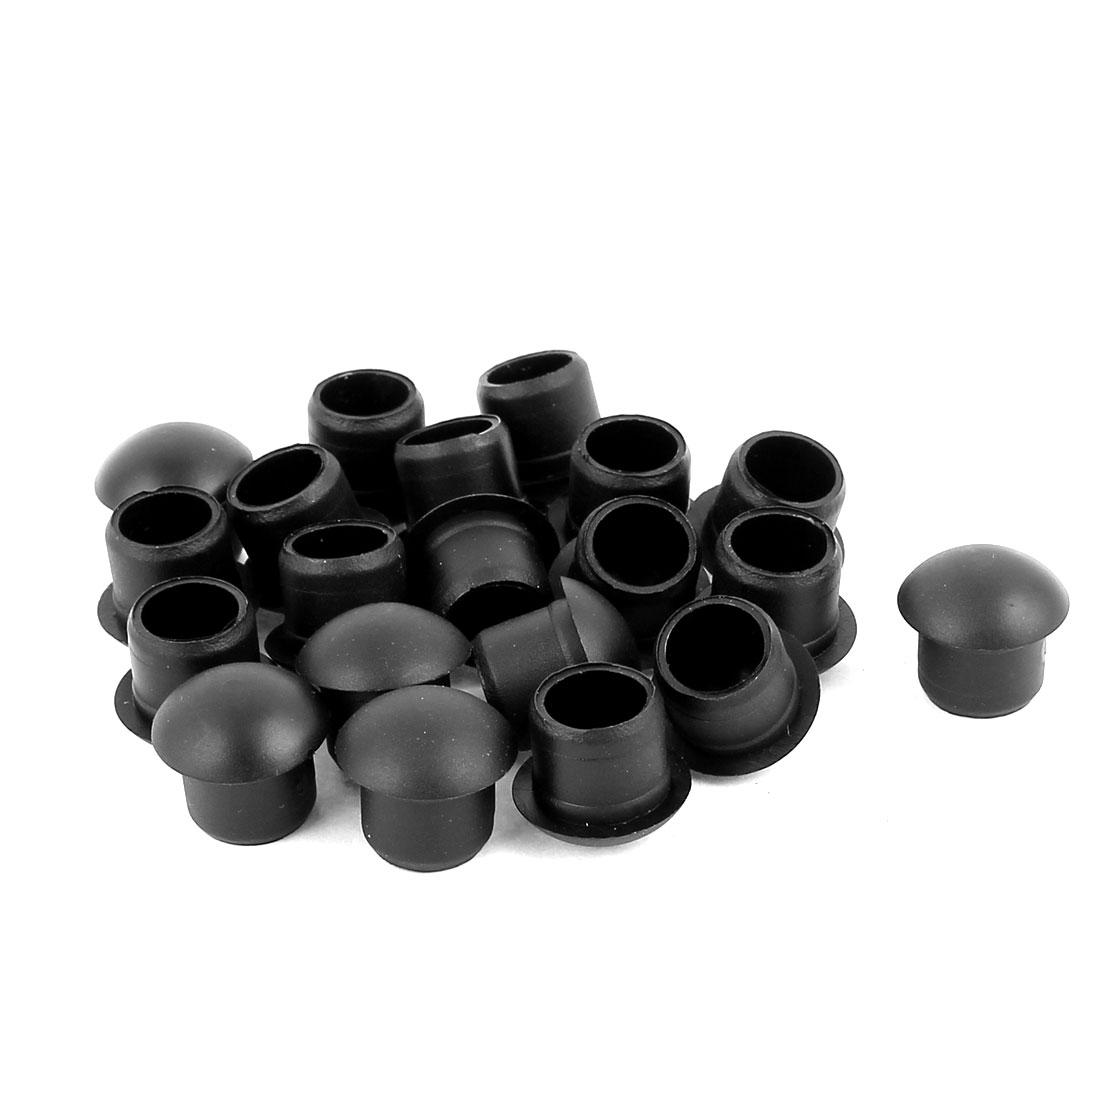 20 Pcs Nylon M12 Diameter Dome Head Cable Hole Caps Cover Insert Black